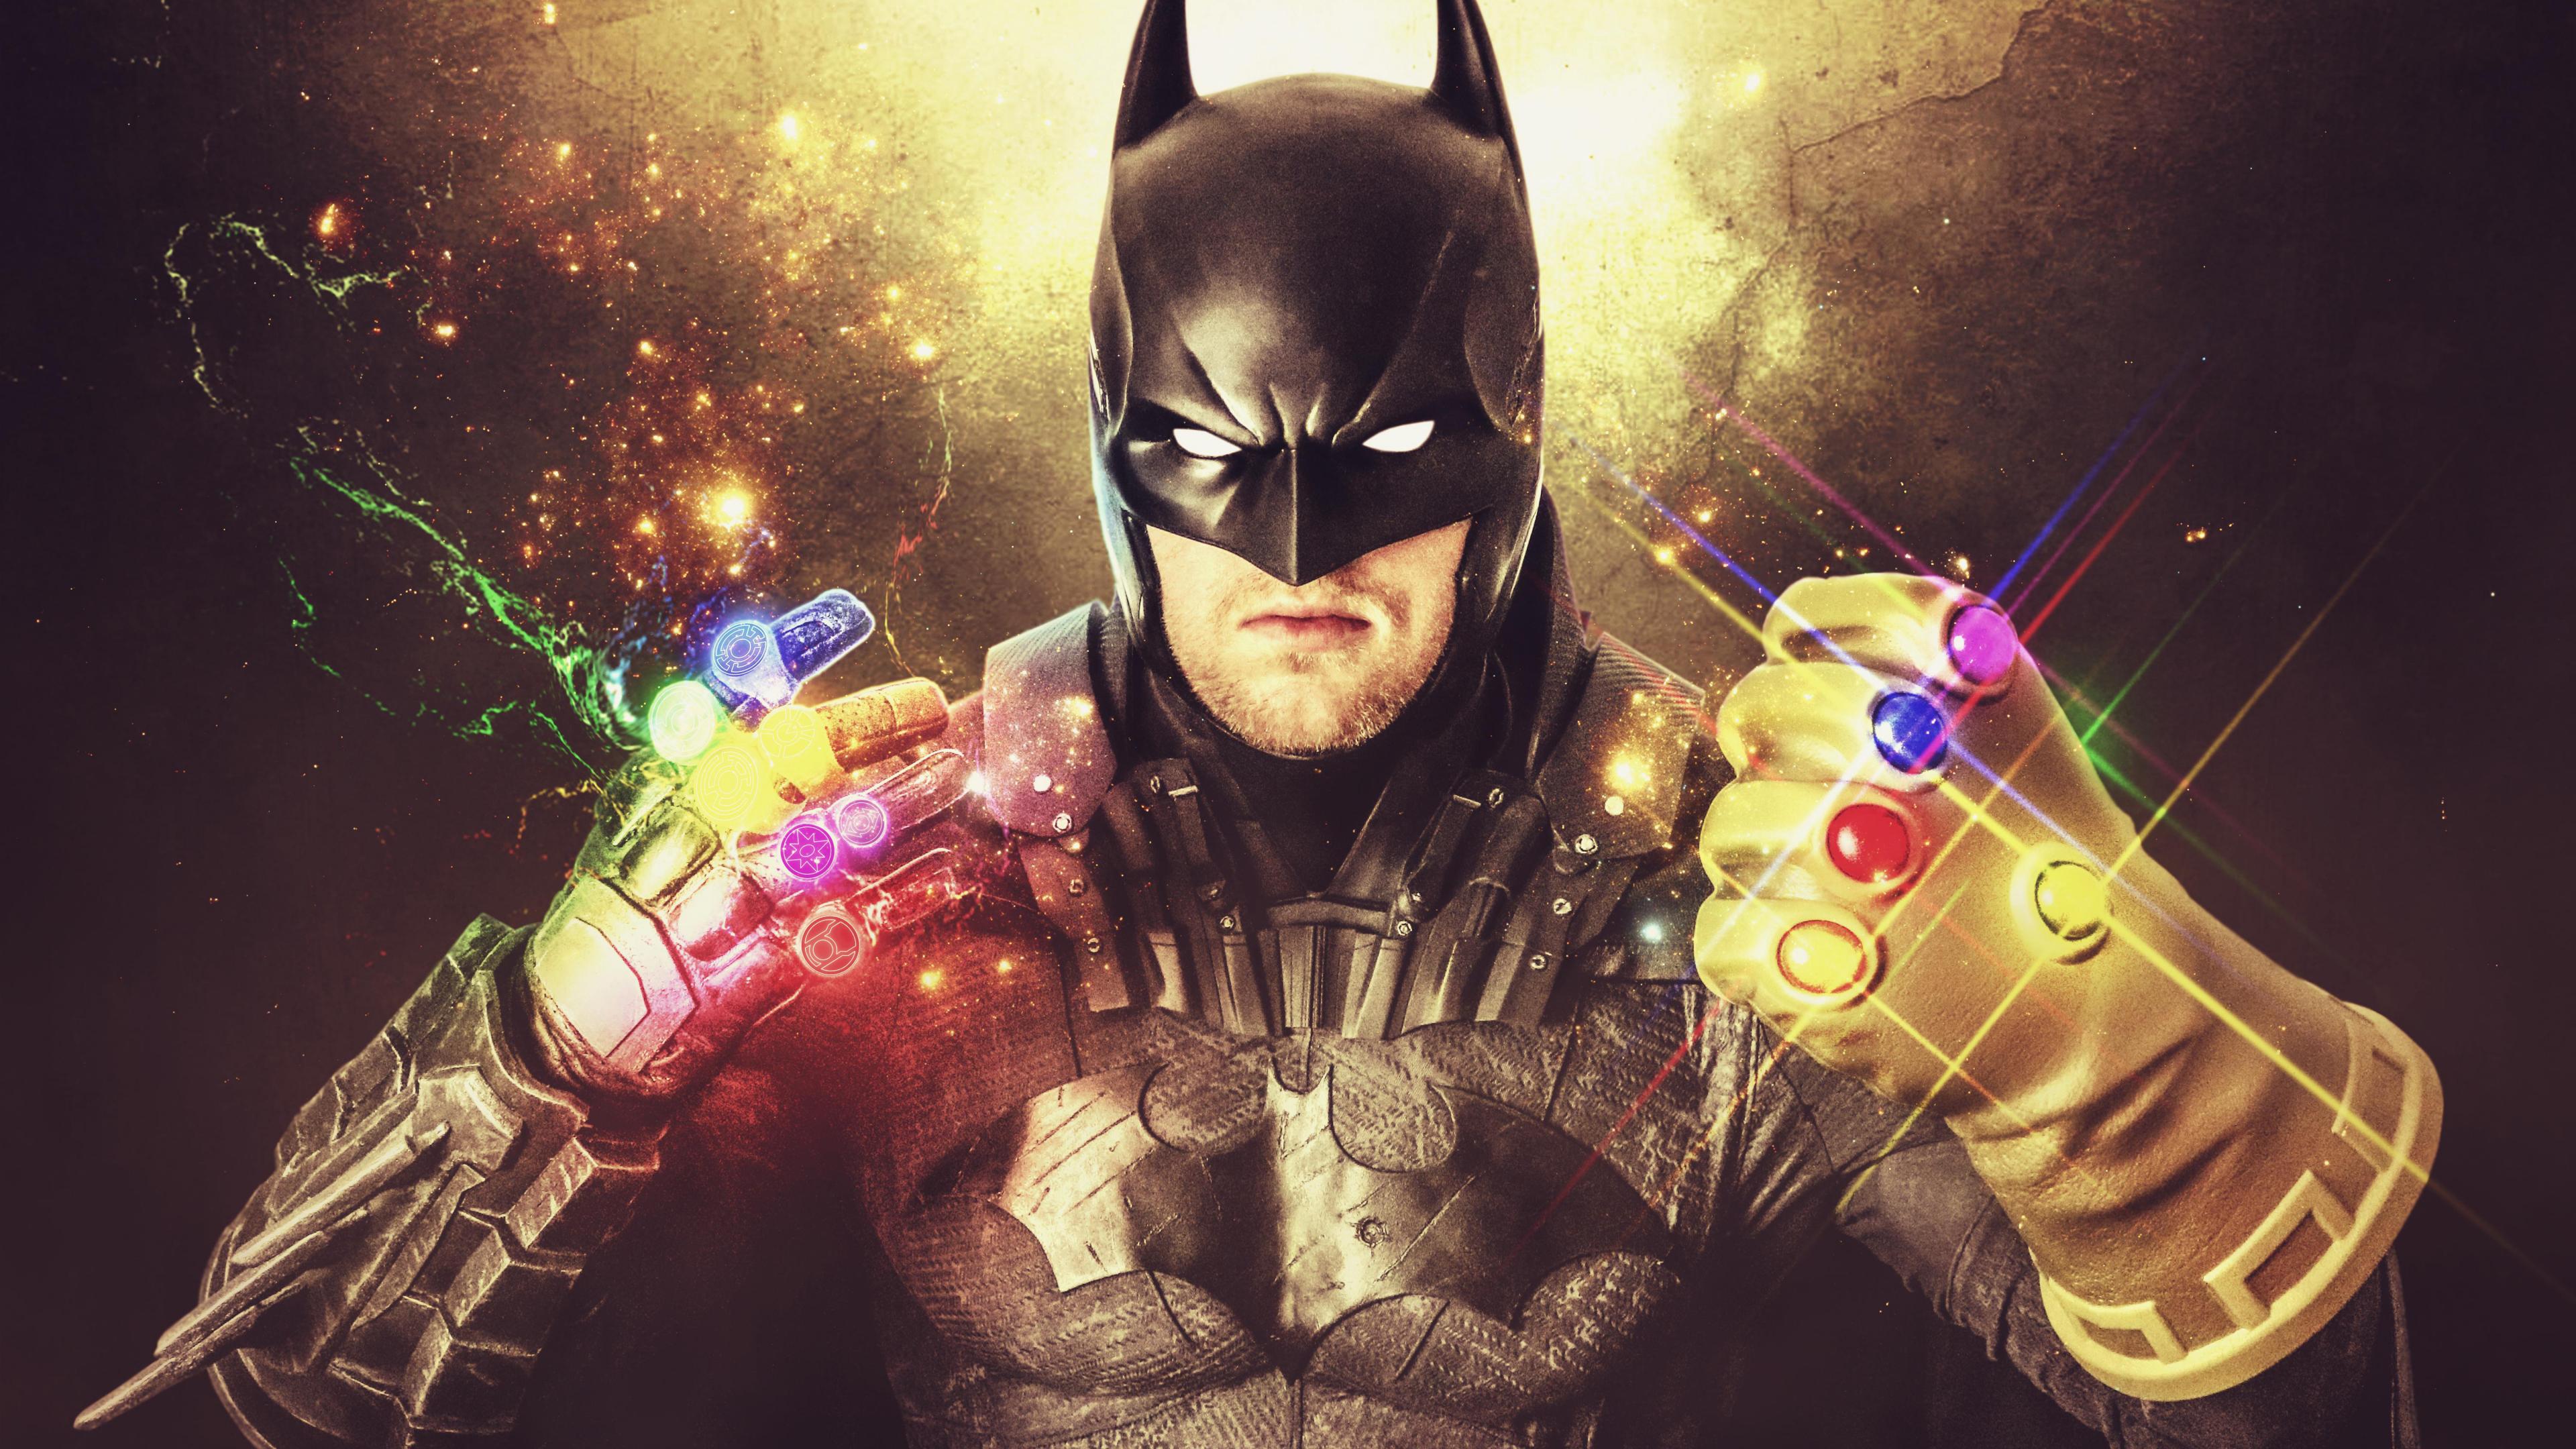 Download 3840x2160 Wallpaper Supreme Power Batman With